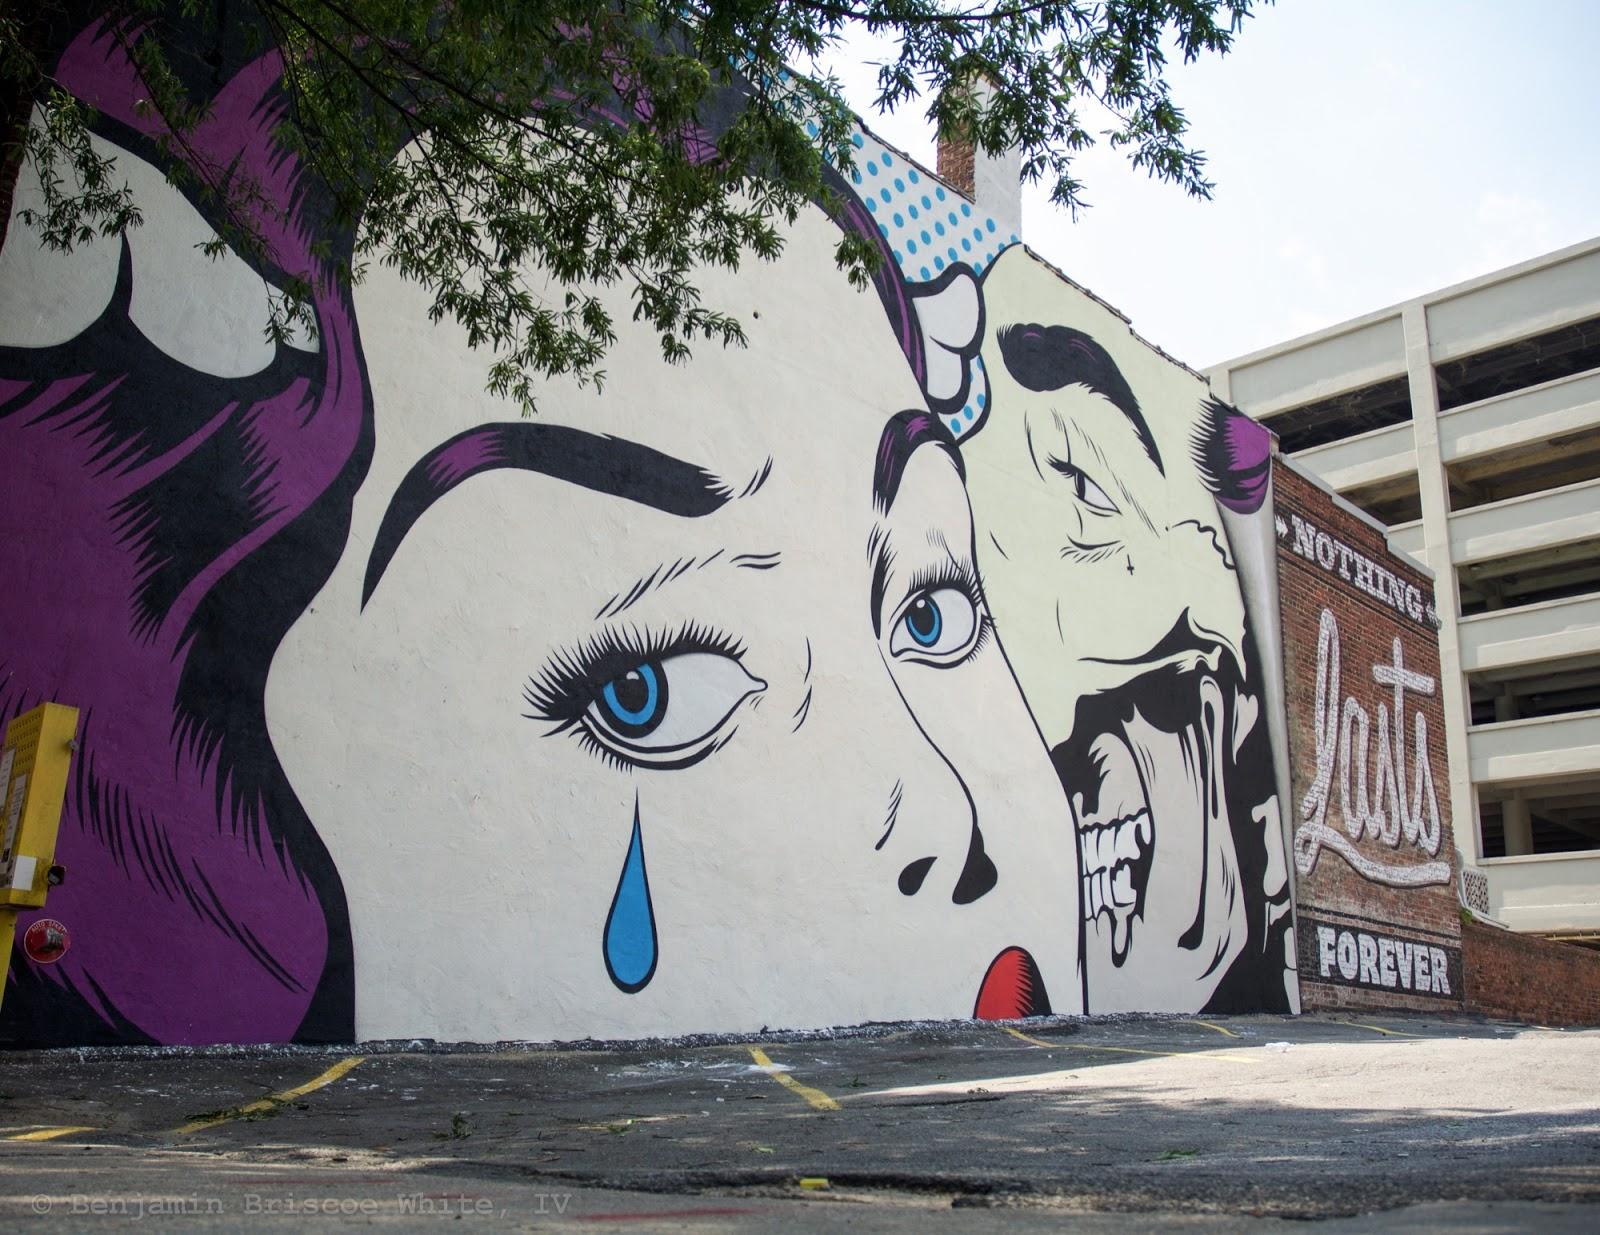 Nothing Lasts Forever A New Piece By Dface In Richmond Virginia Streetartnews Streetartnews